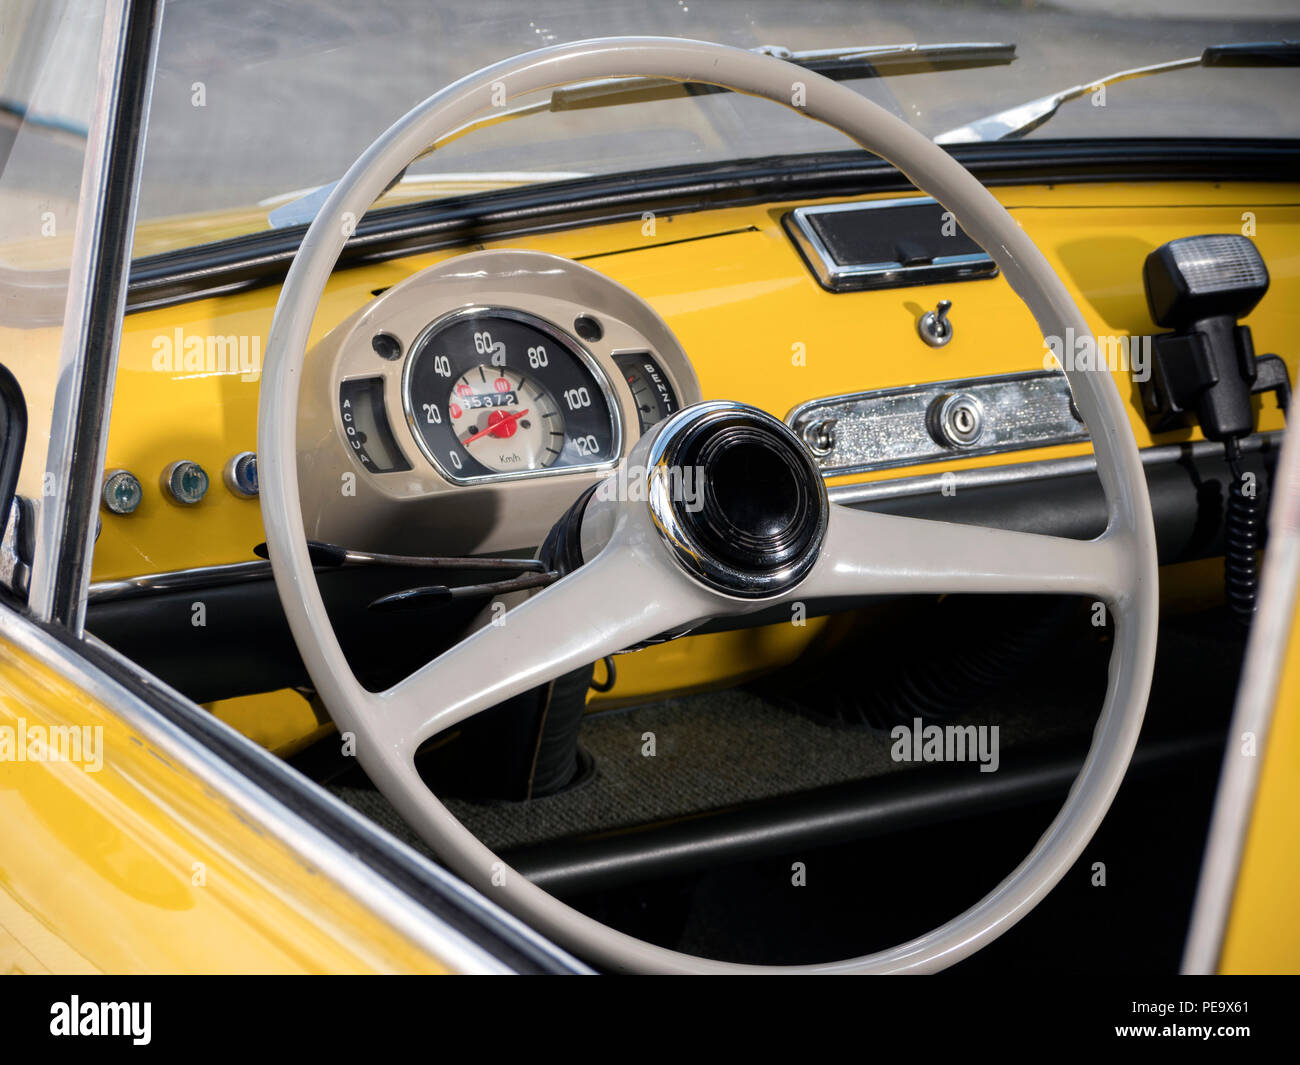 1963 Fiat 600D - Stock Image